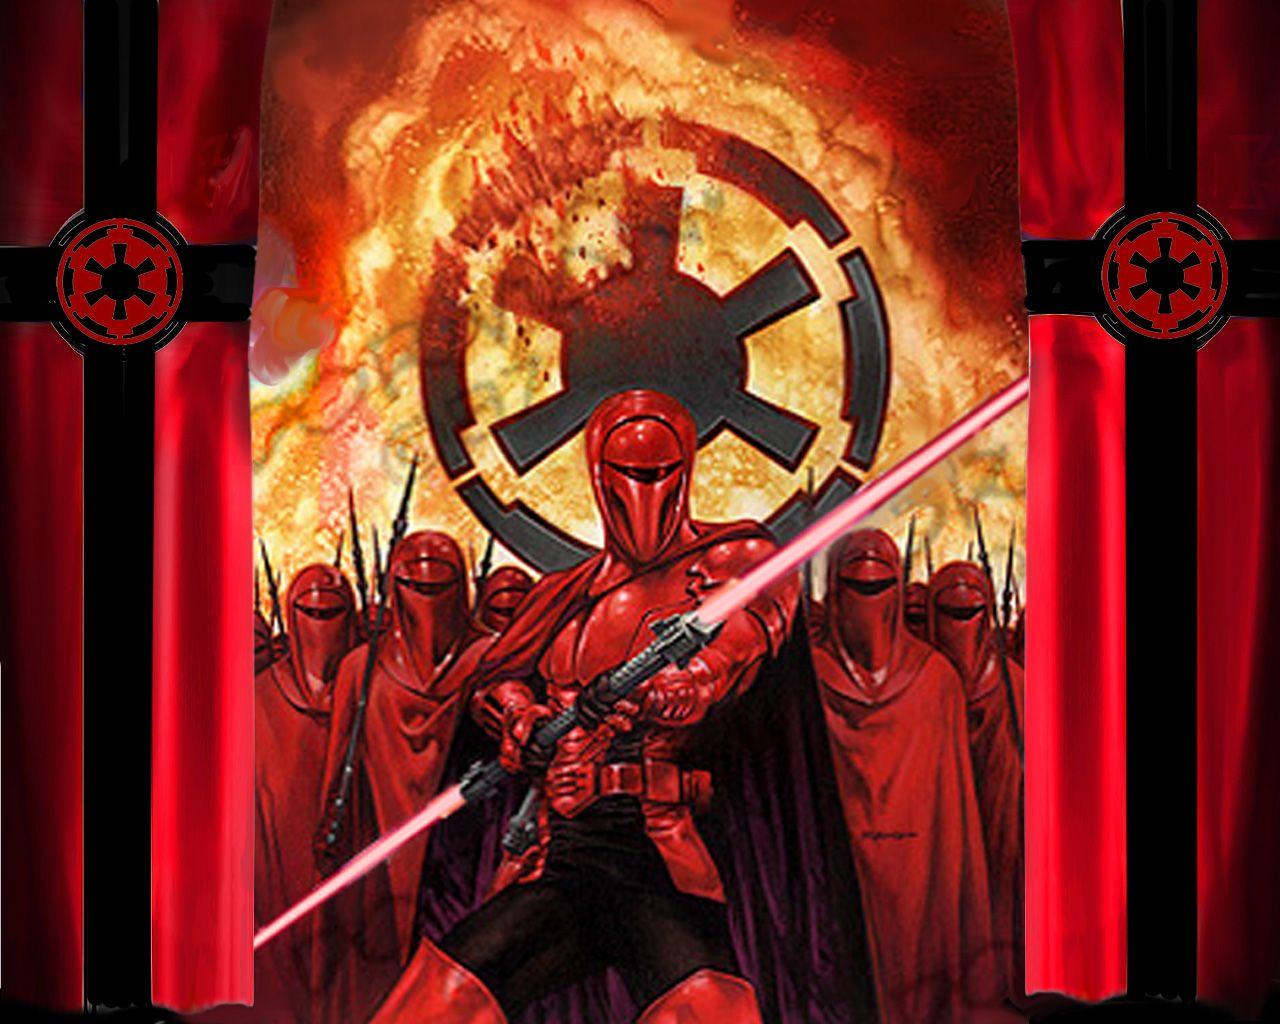 Star Wars Red Guard Wallpaper Wallpapershit